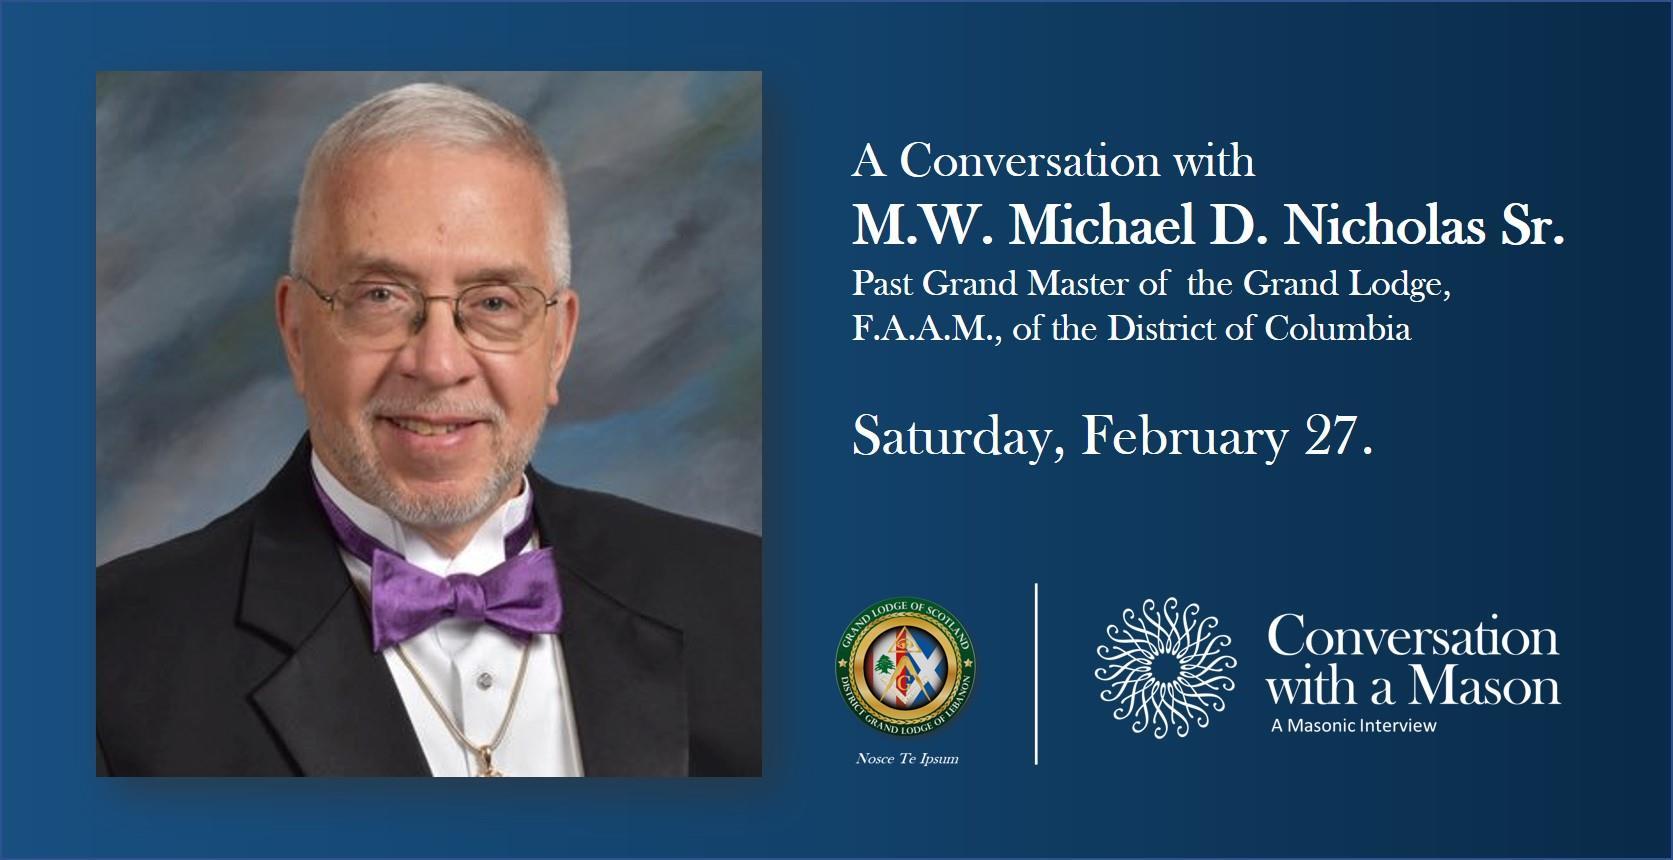 141166878 251698106565705 4827607834883291754 o CONVERSATION WITH A MASON with M.W. Michael D. Nicholas Sr.